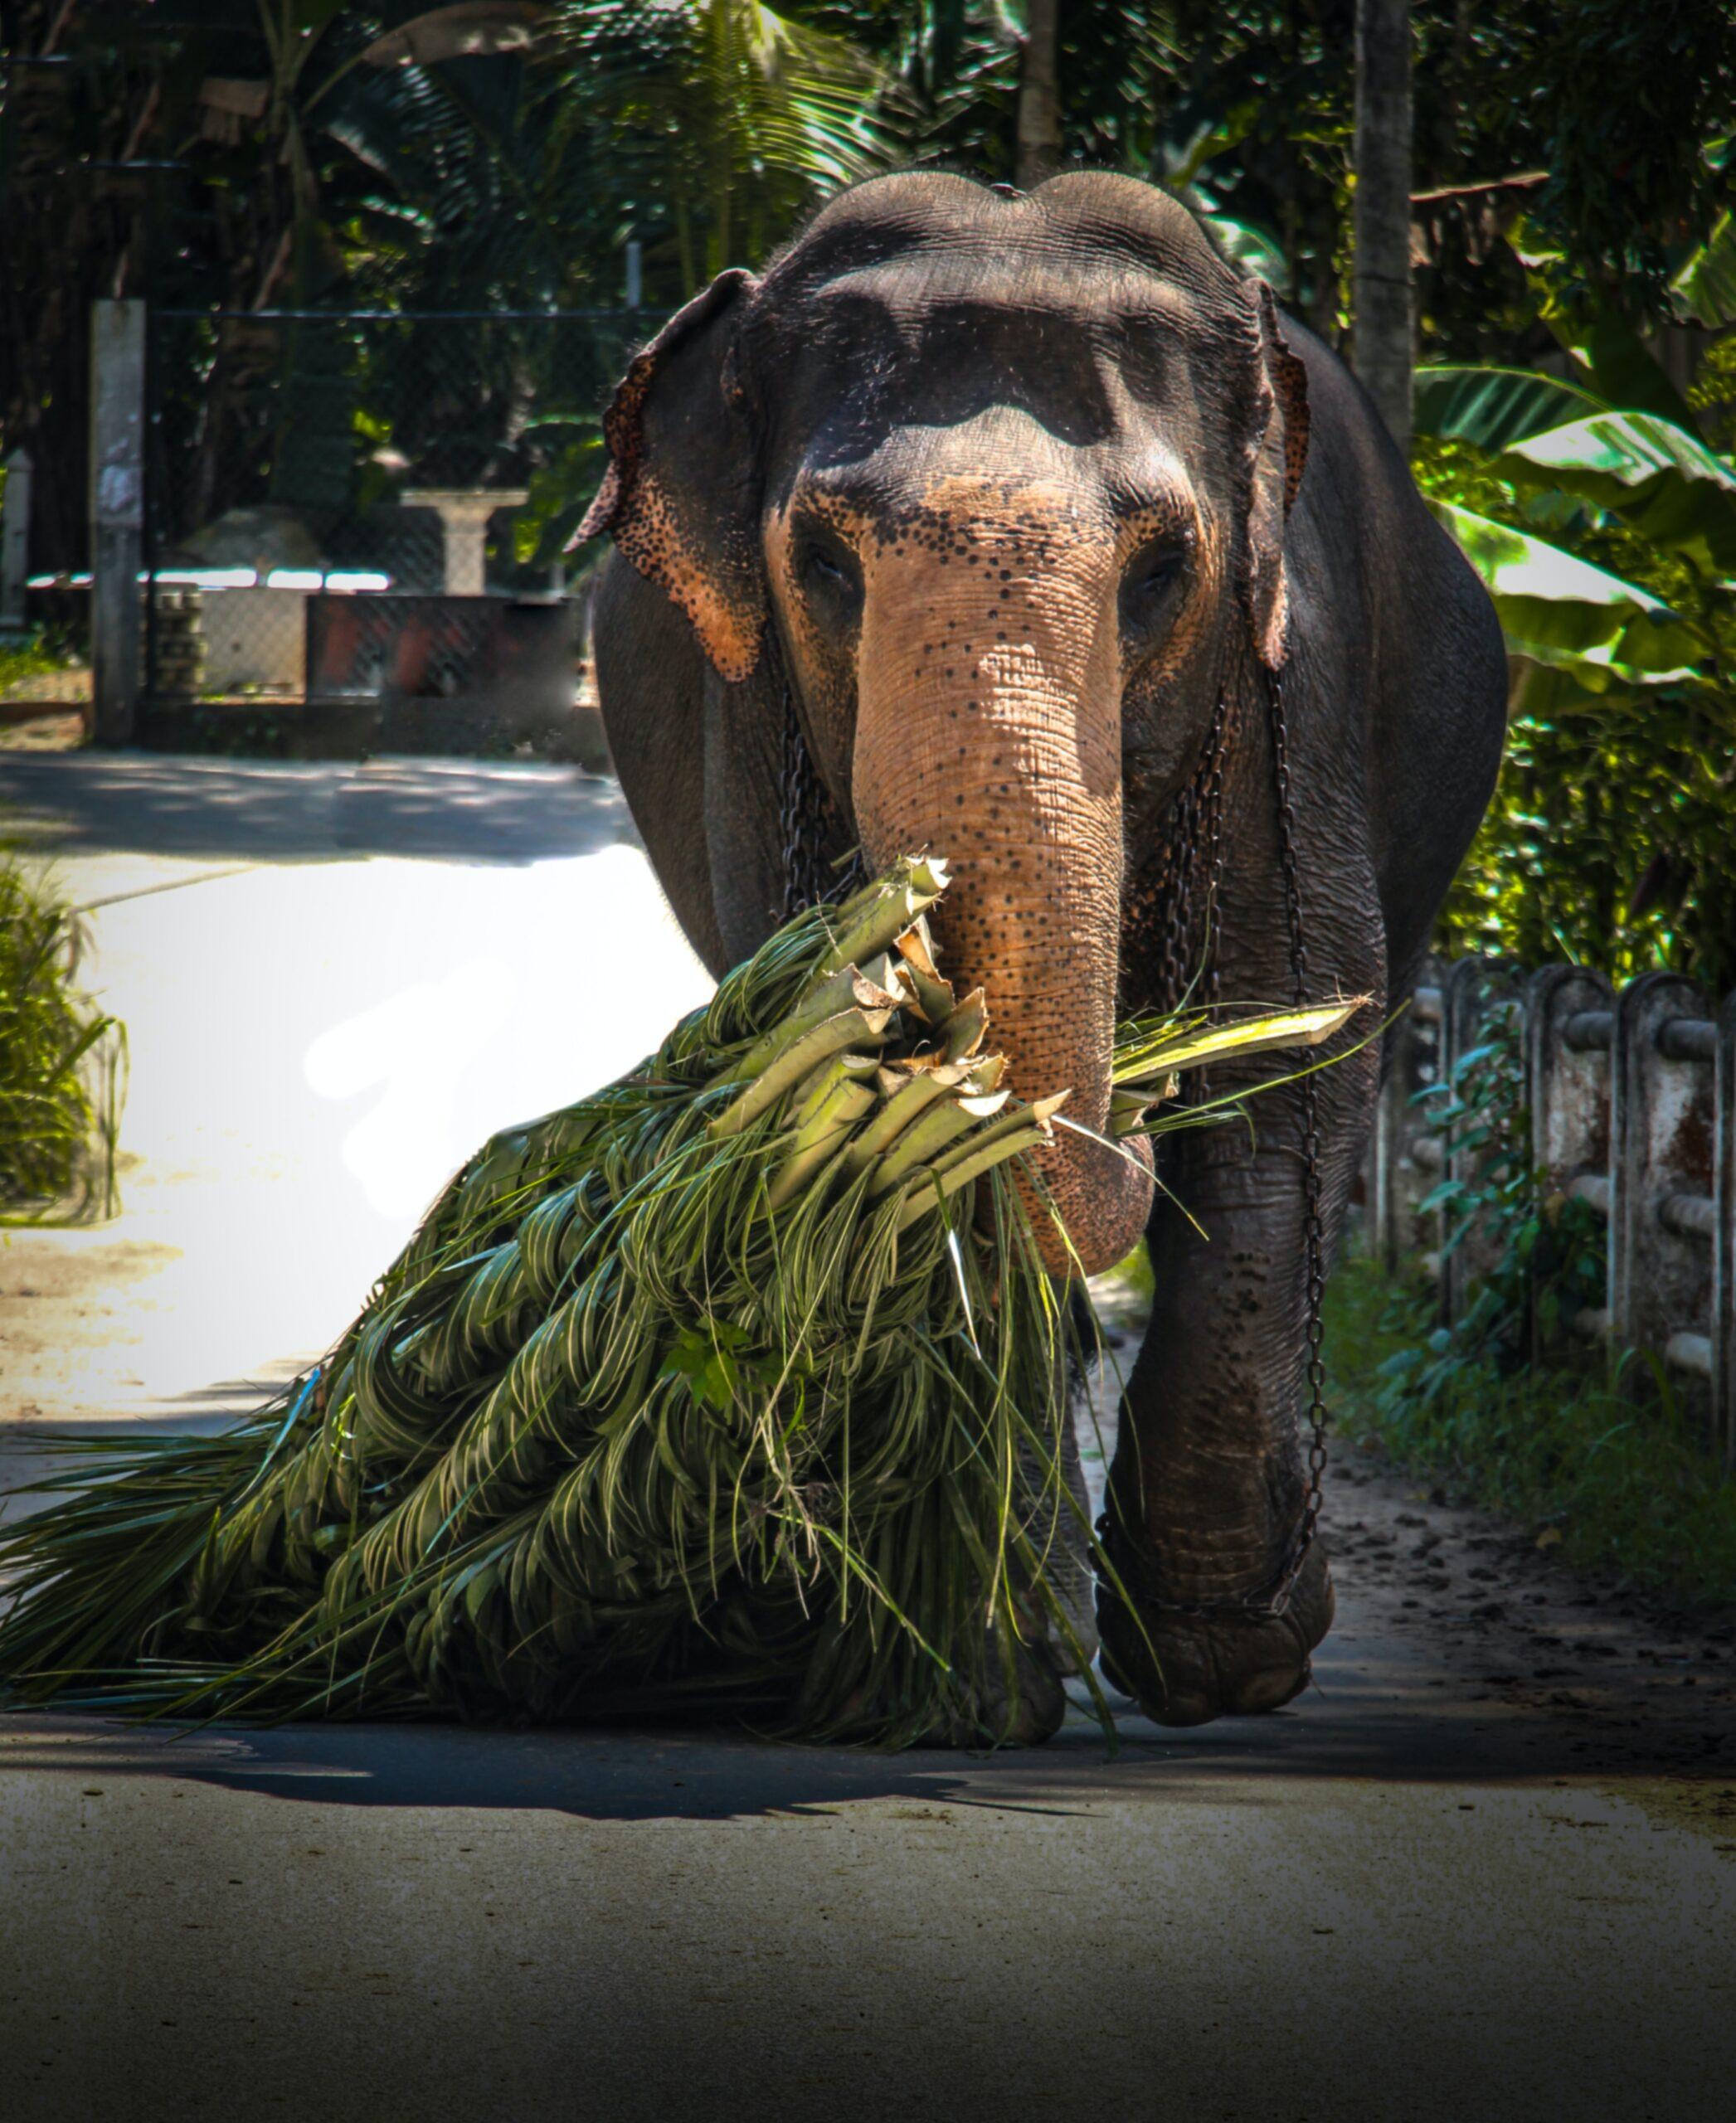 Human-Elephant Conflict Soars in Sri Lanka; Green Activists Blame Habitat Loss